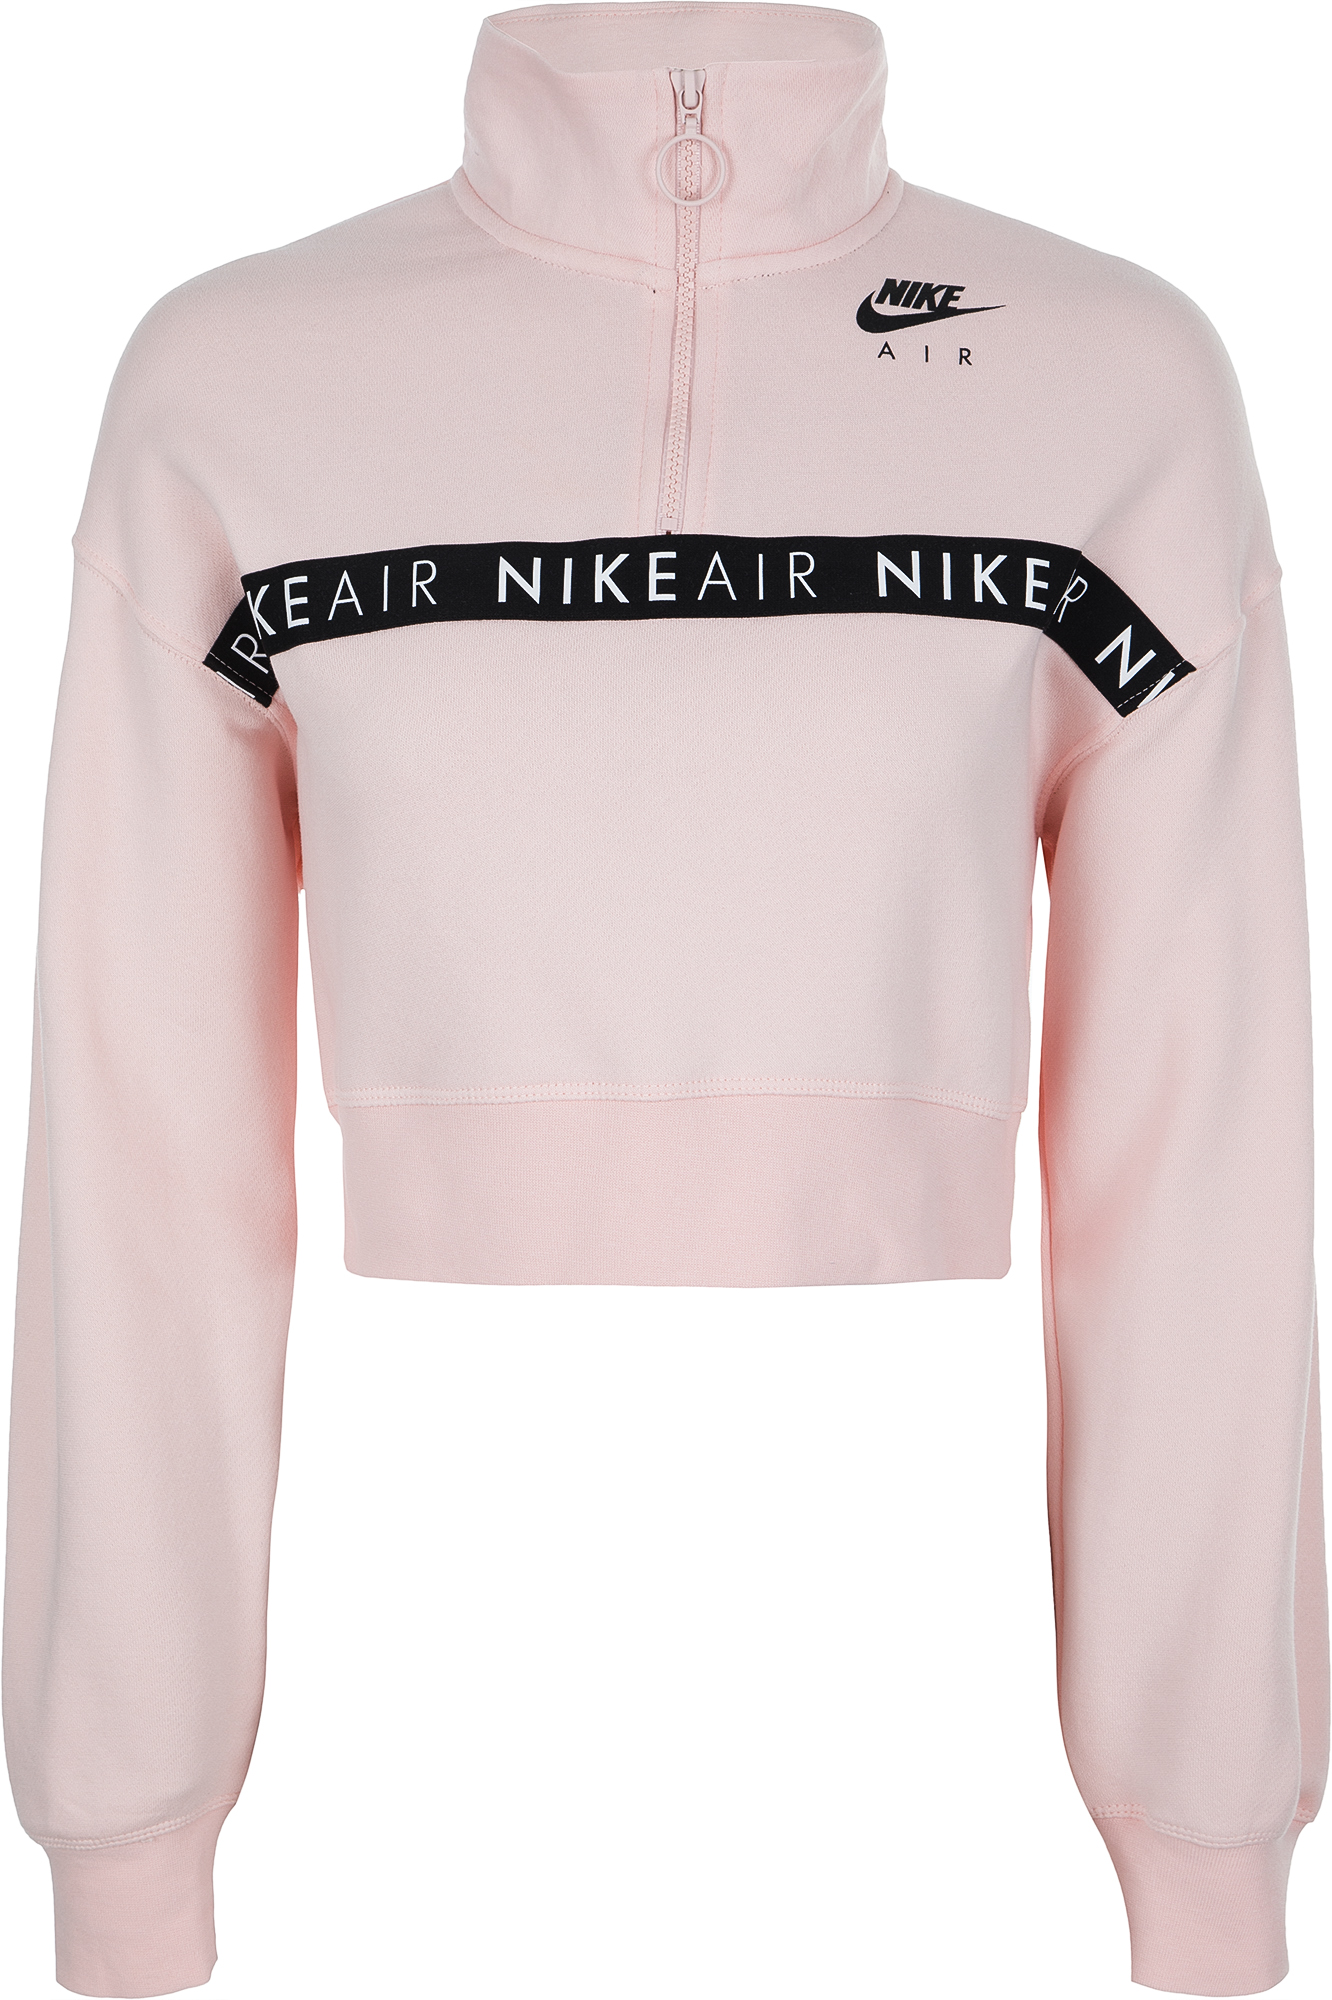 цена на Nike Олимпийка женская Nike Air, размер 46-48